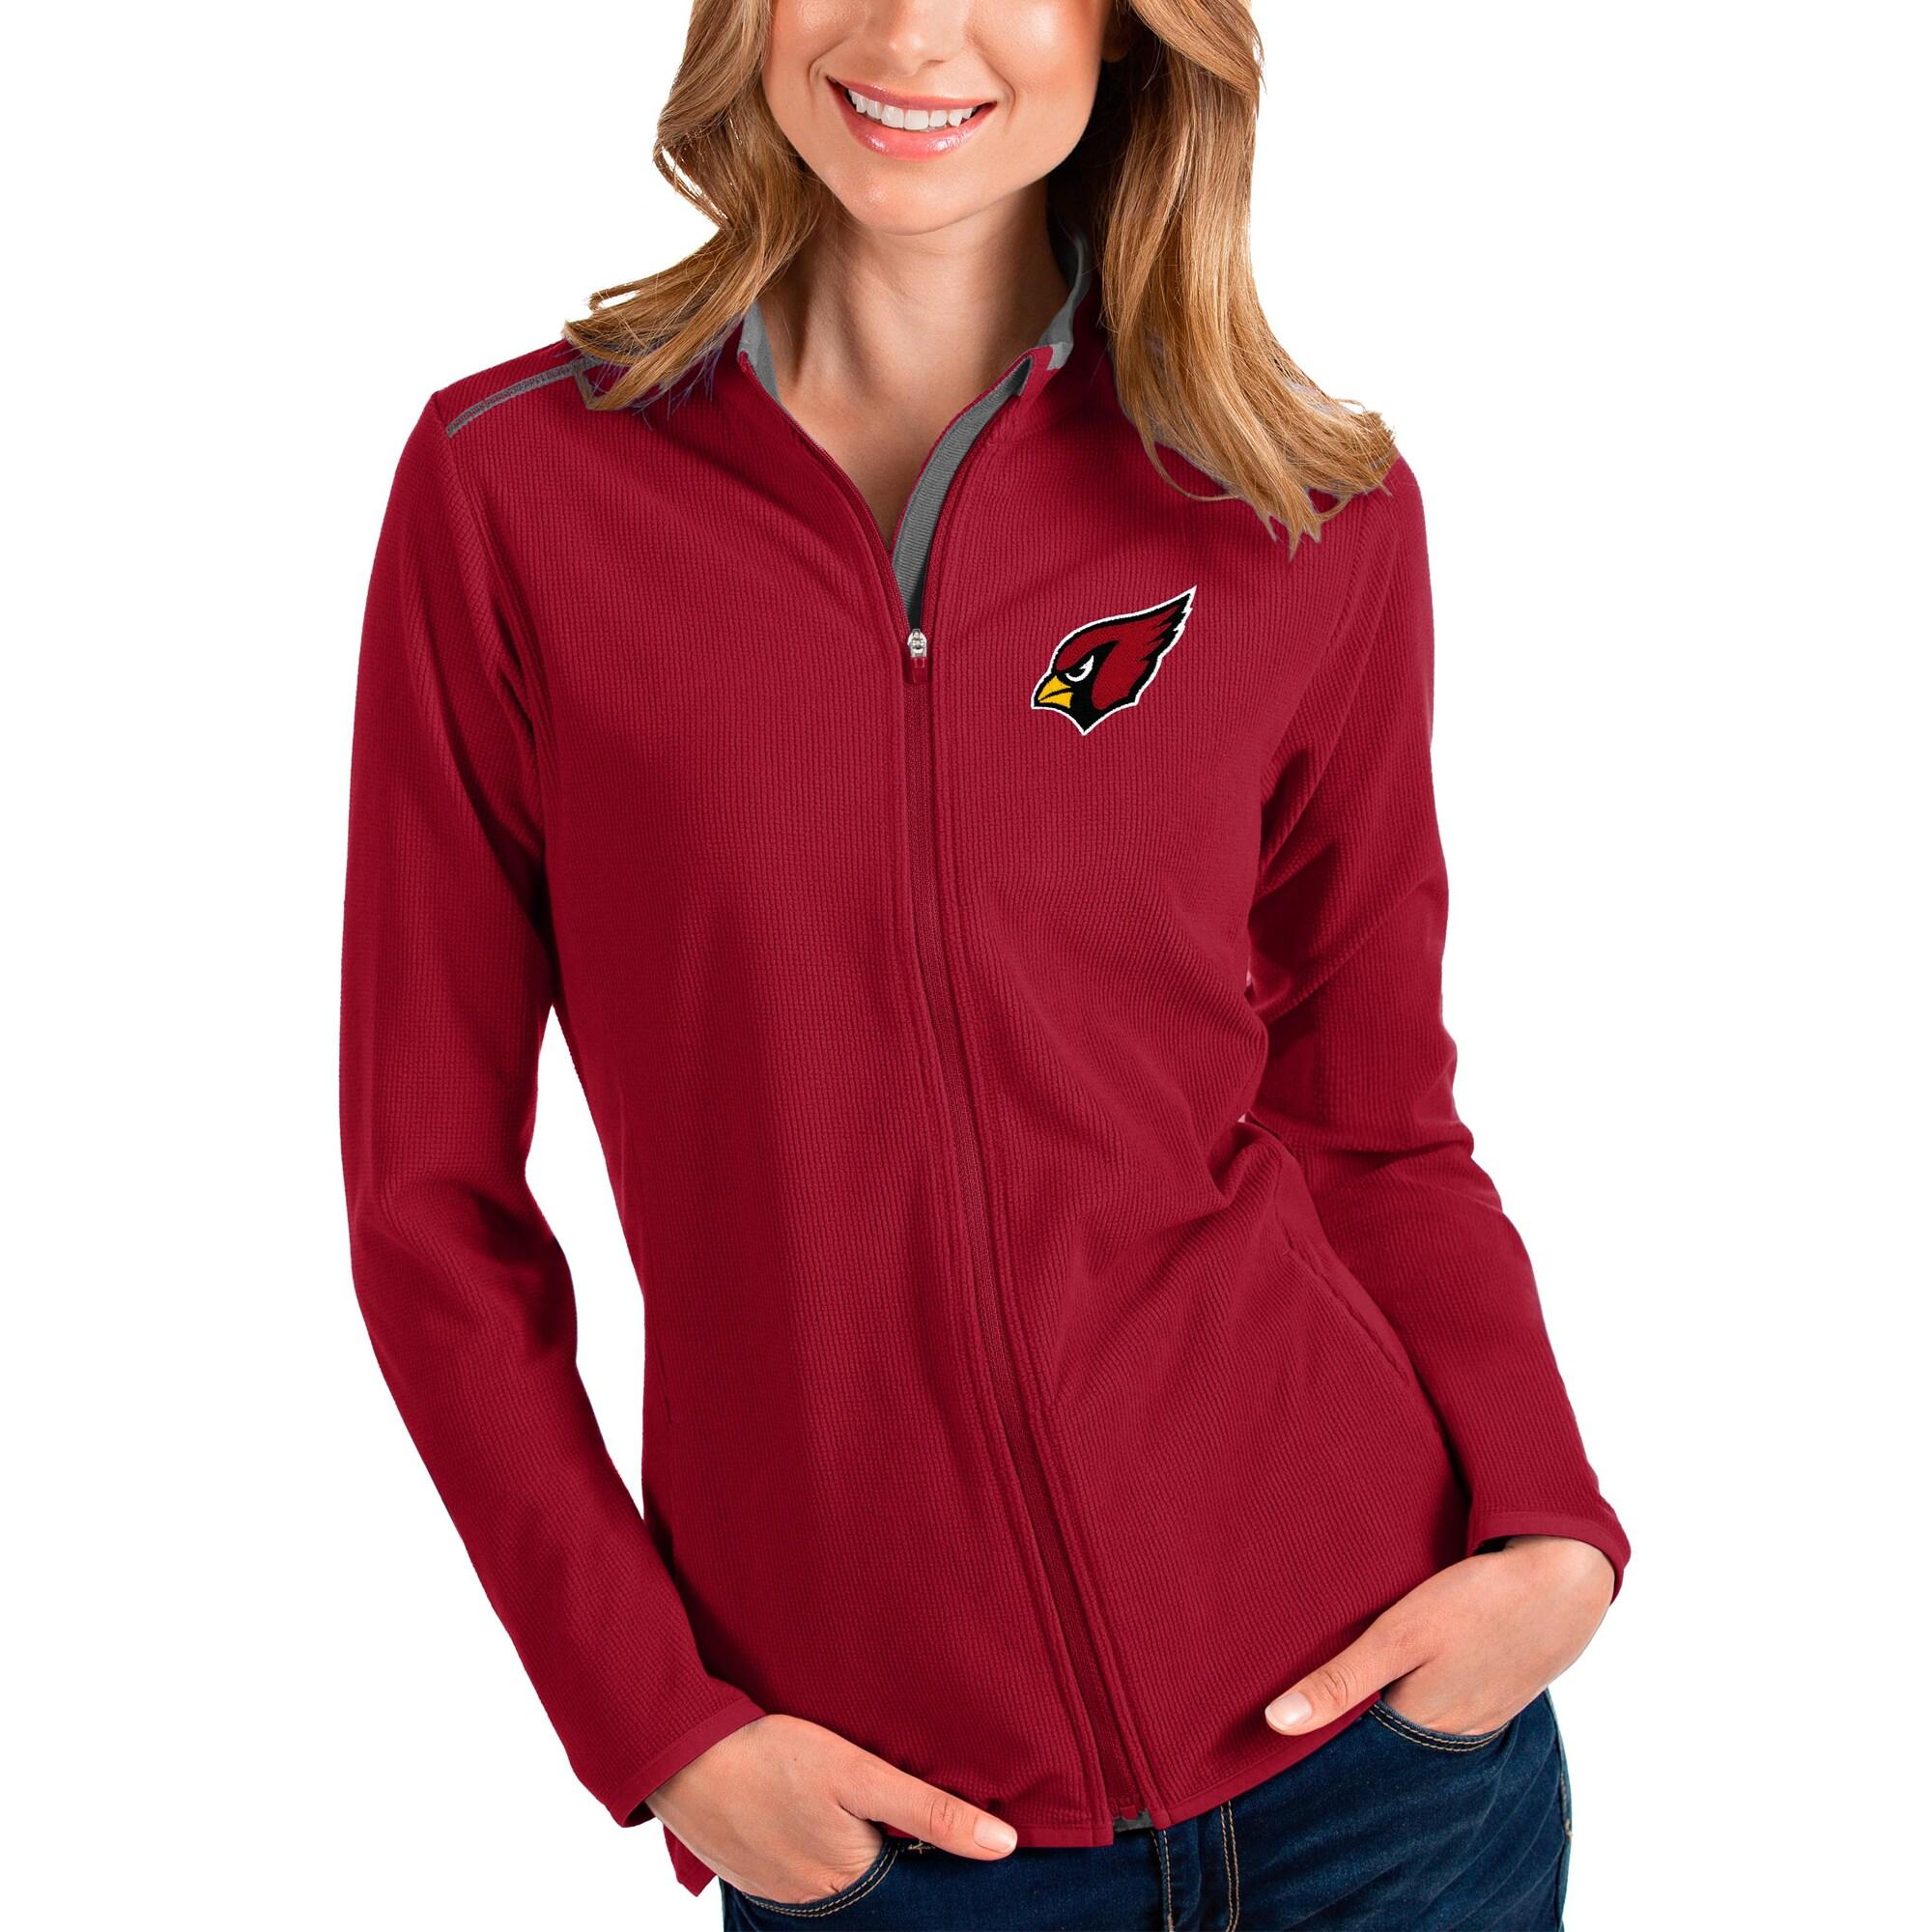 Arizona Cardinals Antigua Women's Glacier Full-Zip Jacket - Cardinal